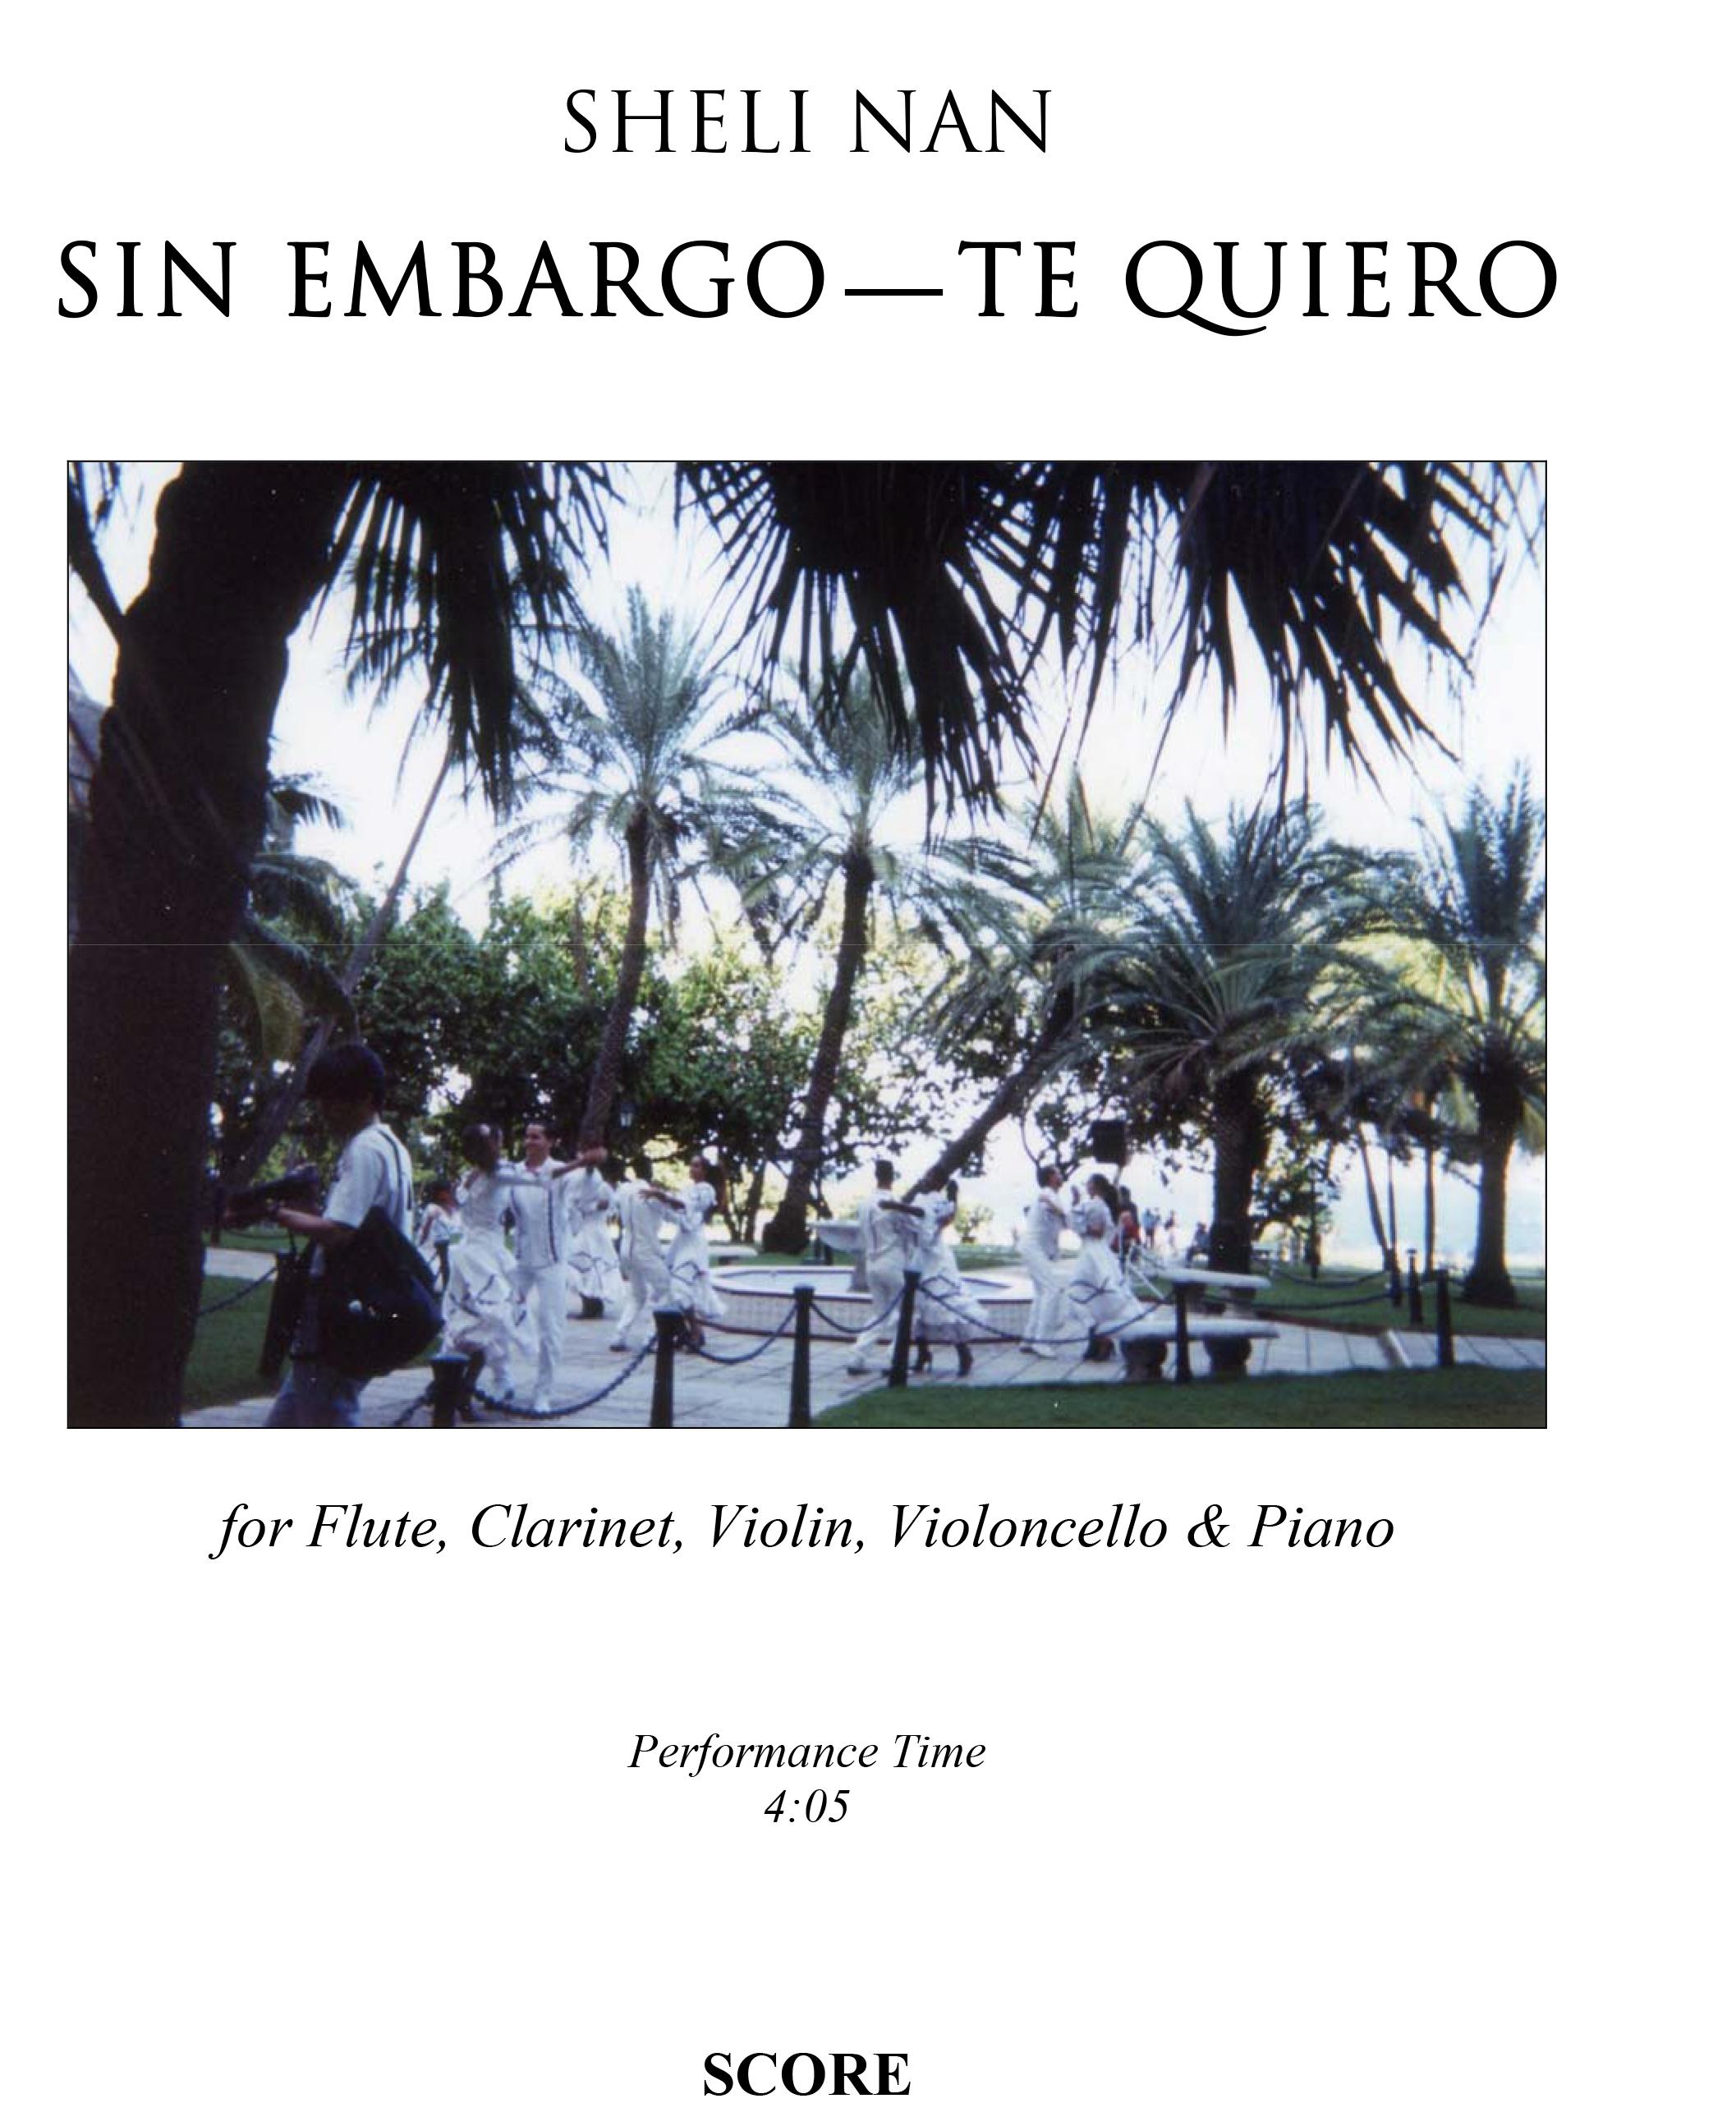 SIN EMBARGO TE QUIERO - cover.jpg